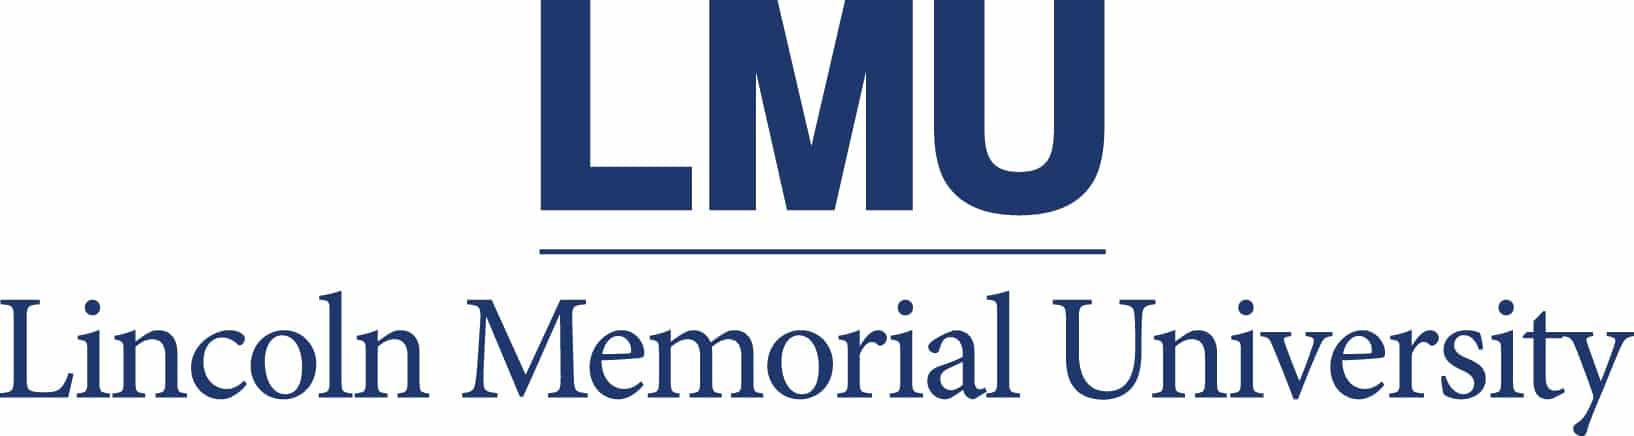 Lincoln Memorial University logo